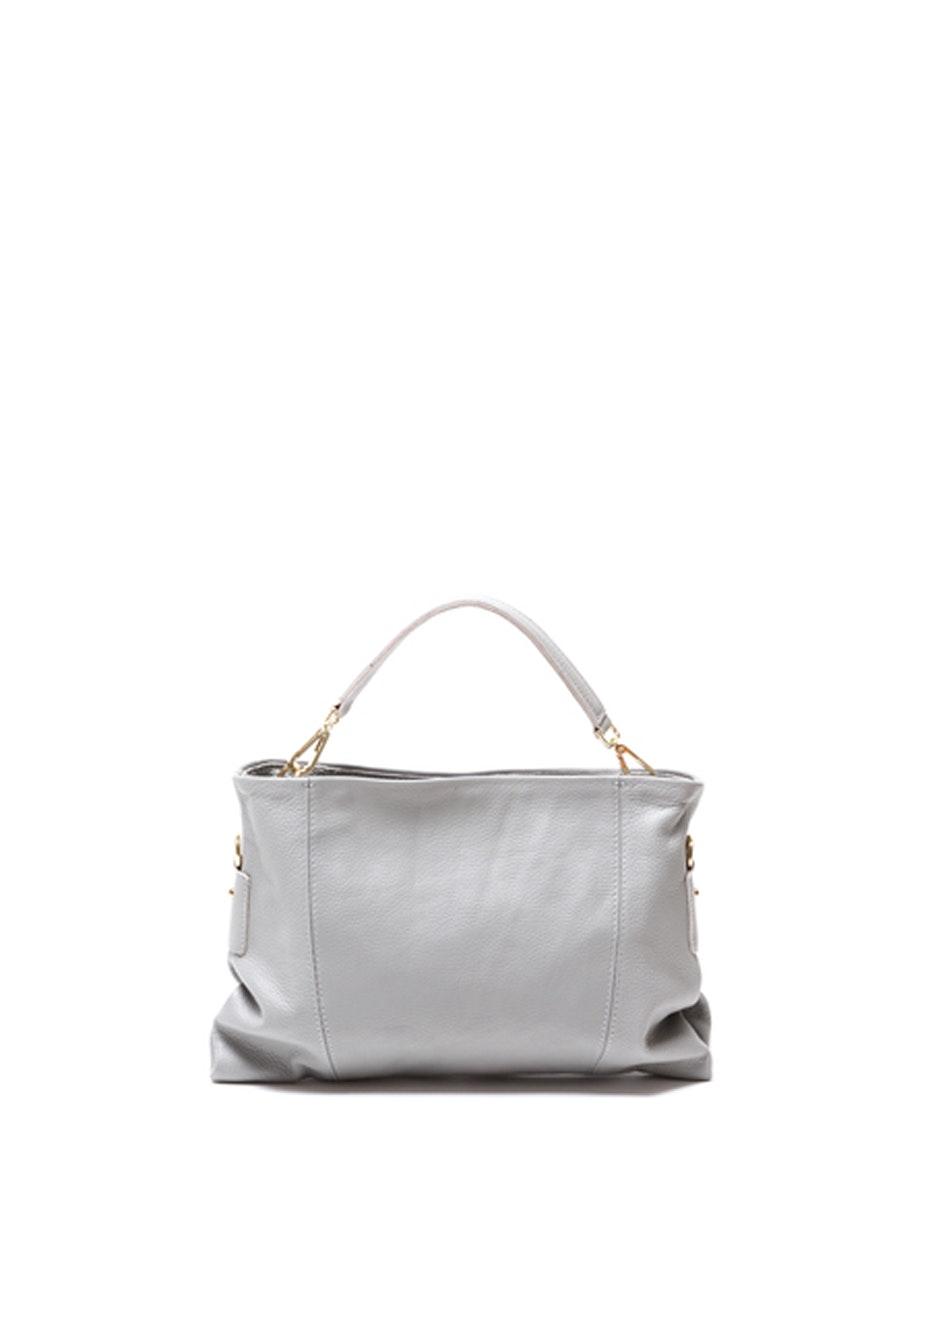 Sofia Cardoni - Sc1143 Crossbody Bag - Grey